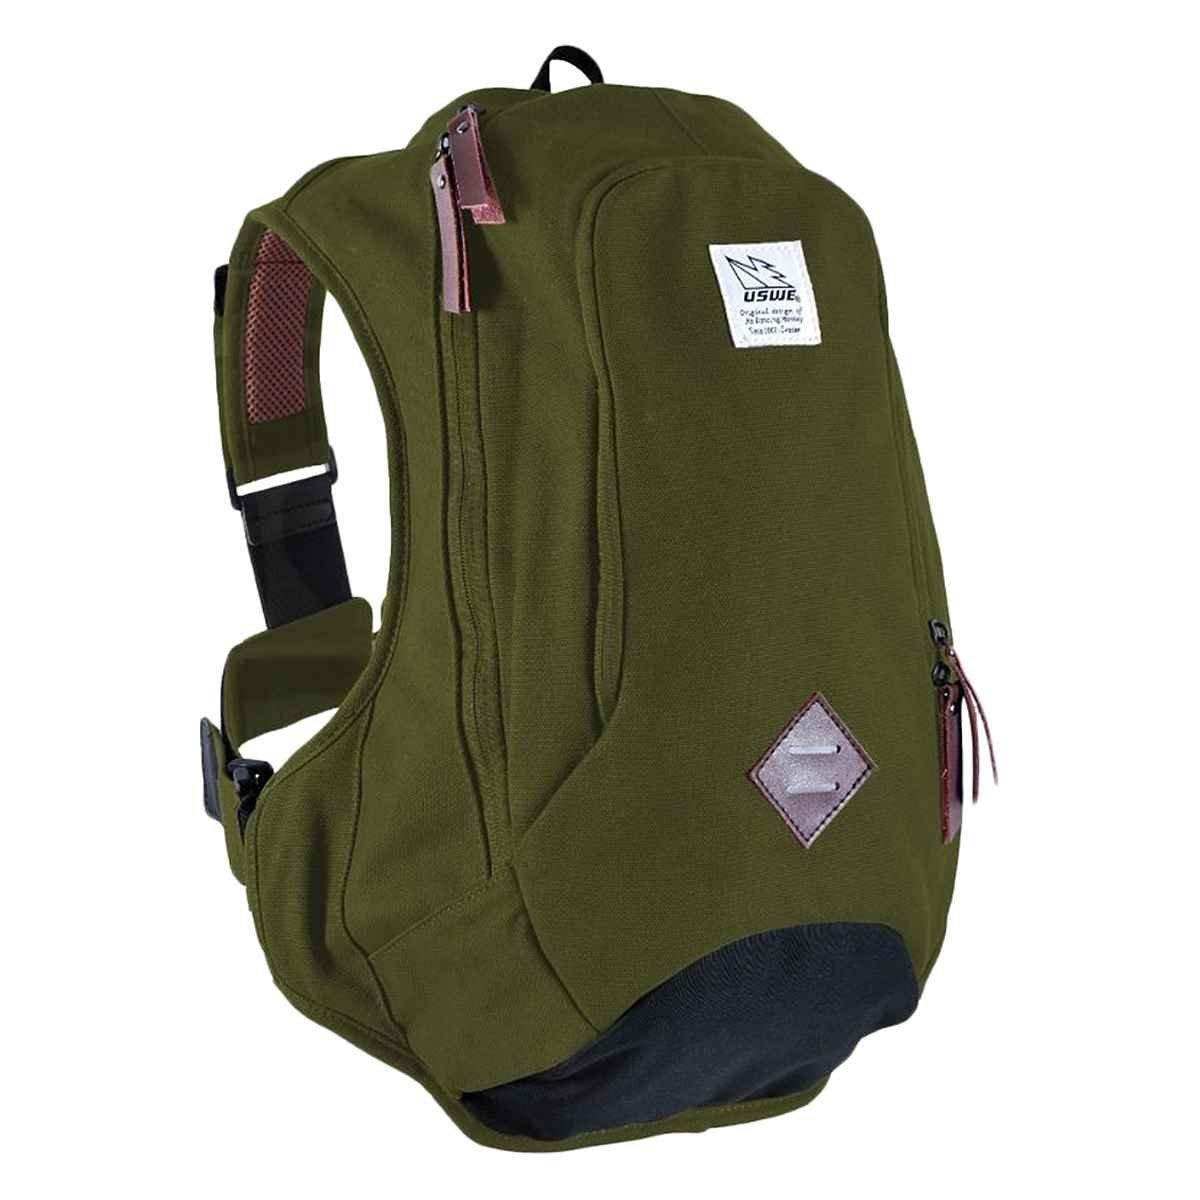 USWE Bag Uswe Hydration Scrambler-16 Gn - K-2160412